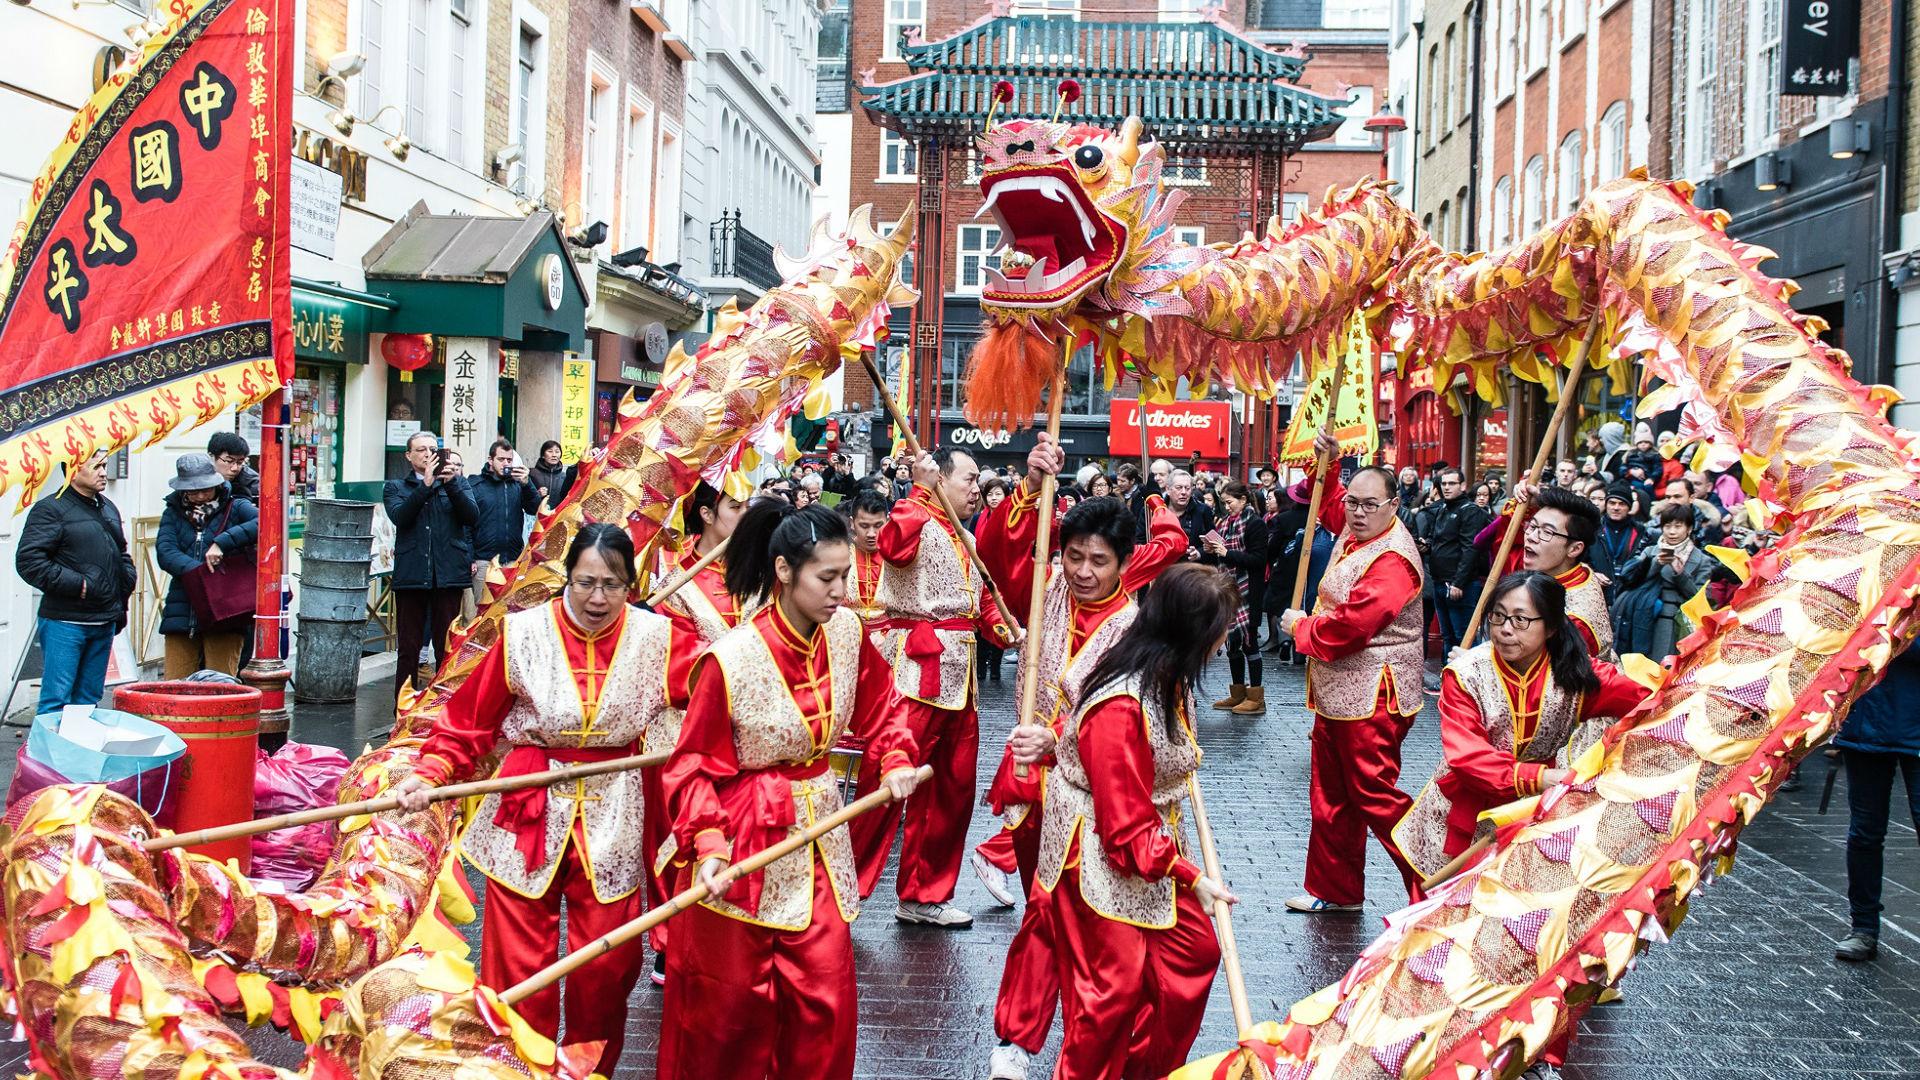 Dragon dance during Chinese New Year. Photo: Jon Mo